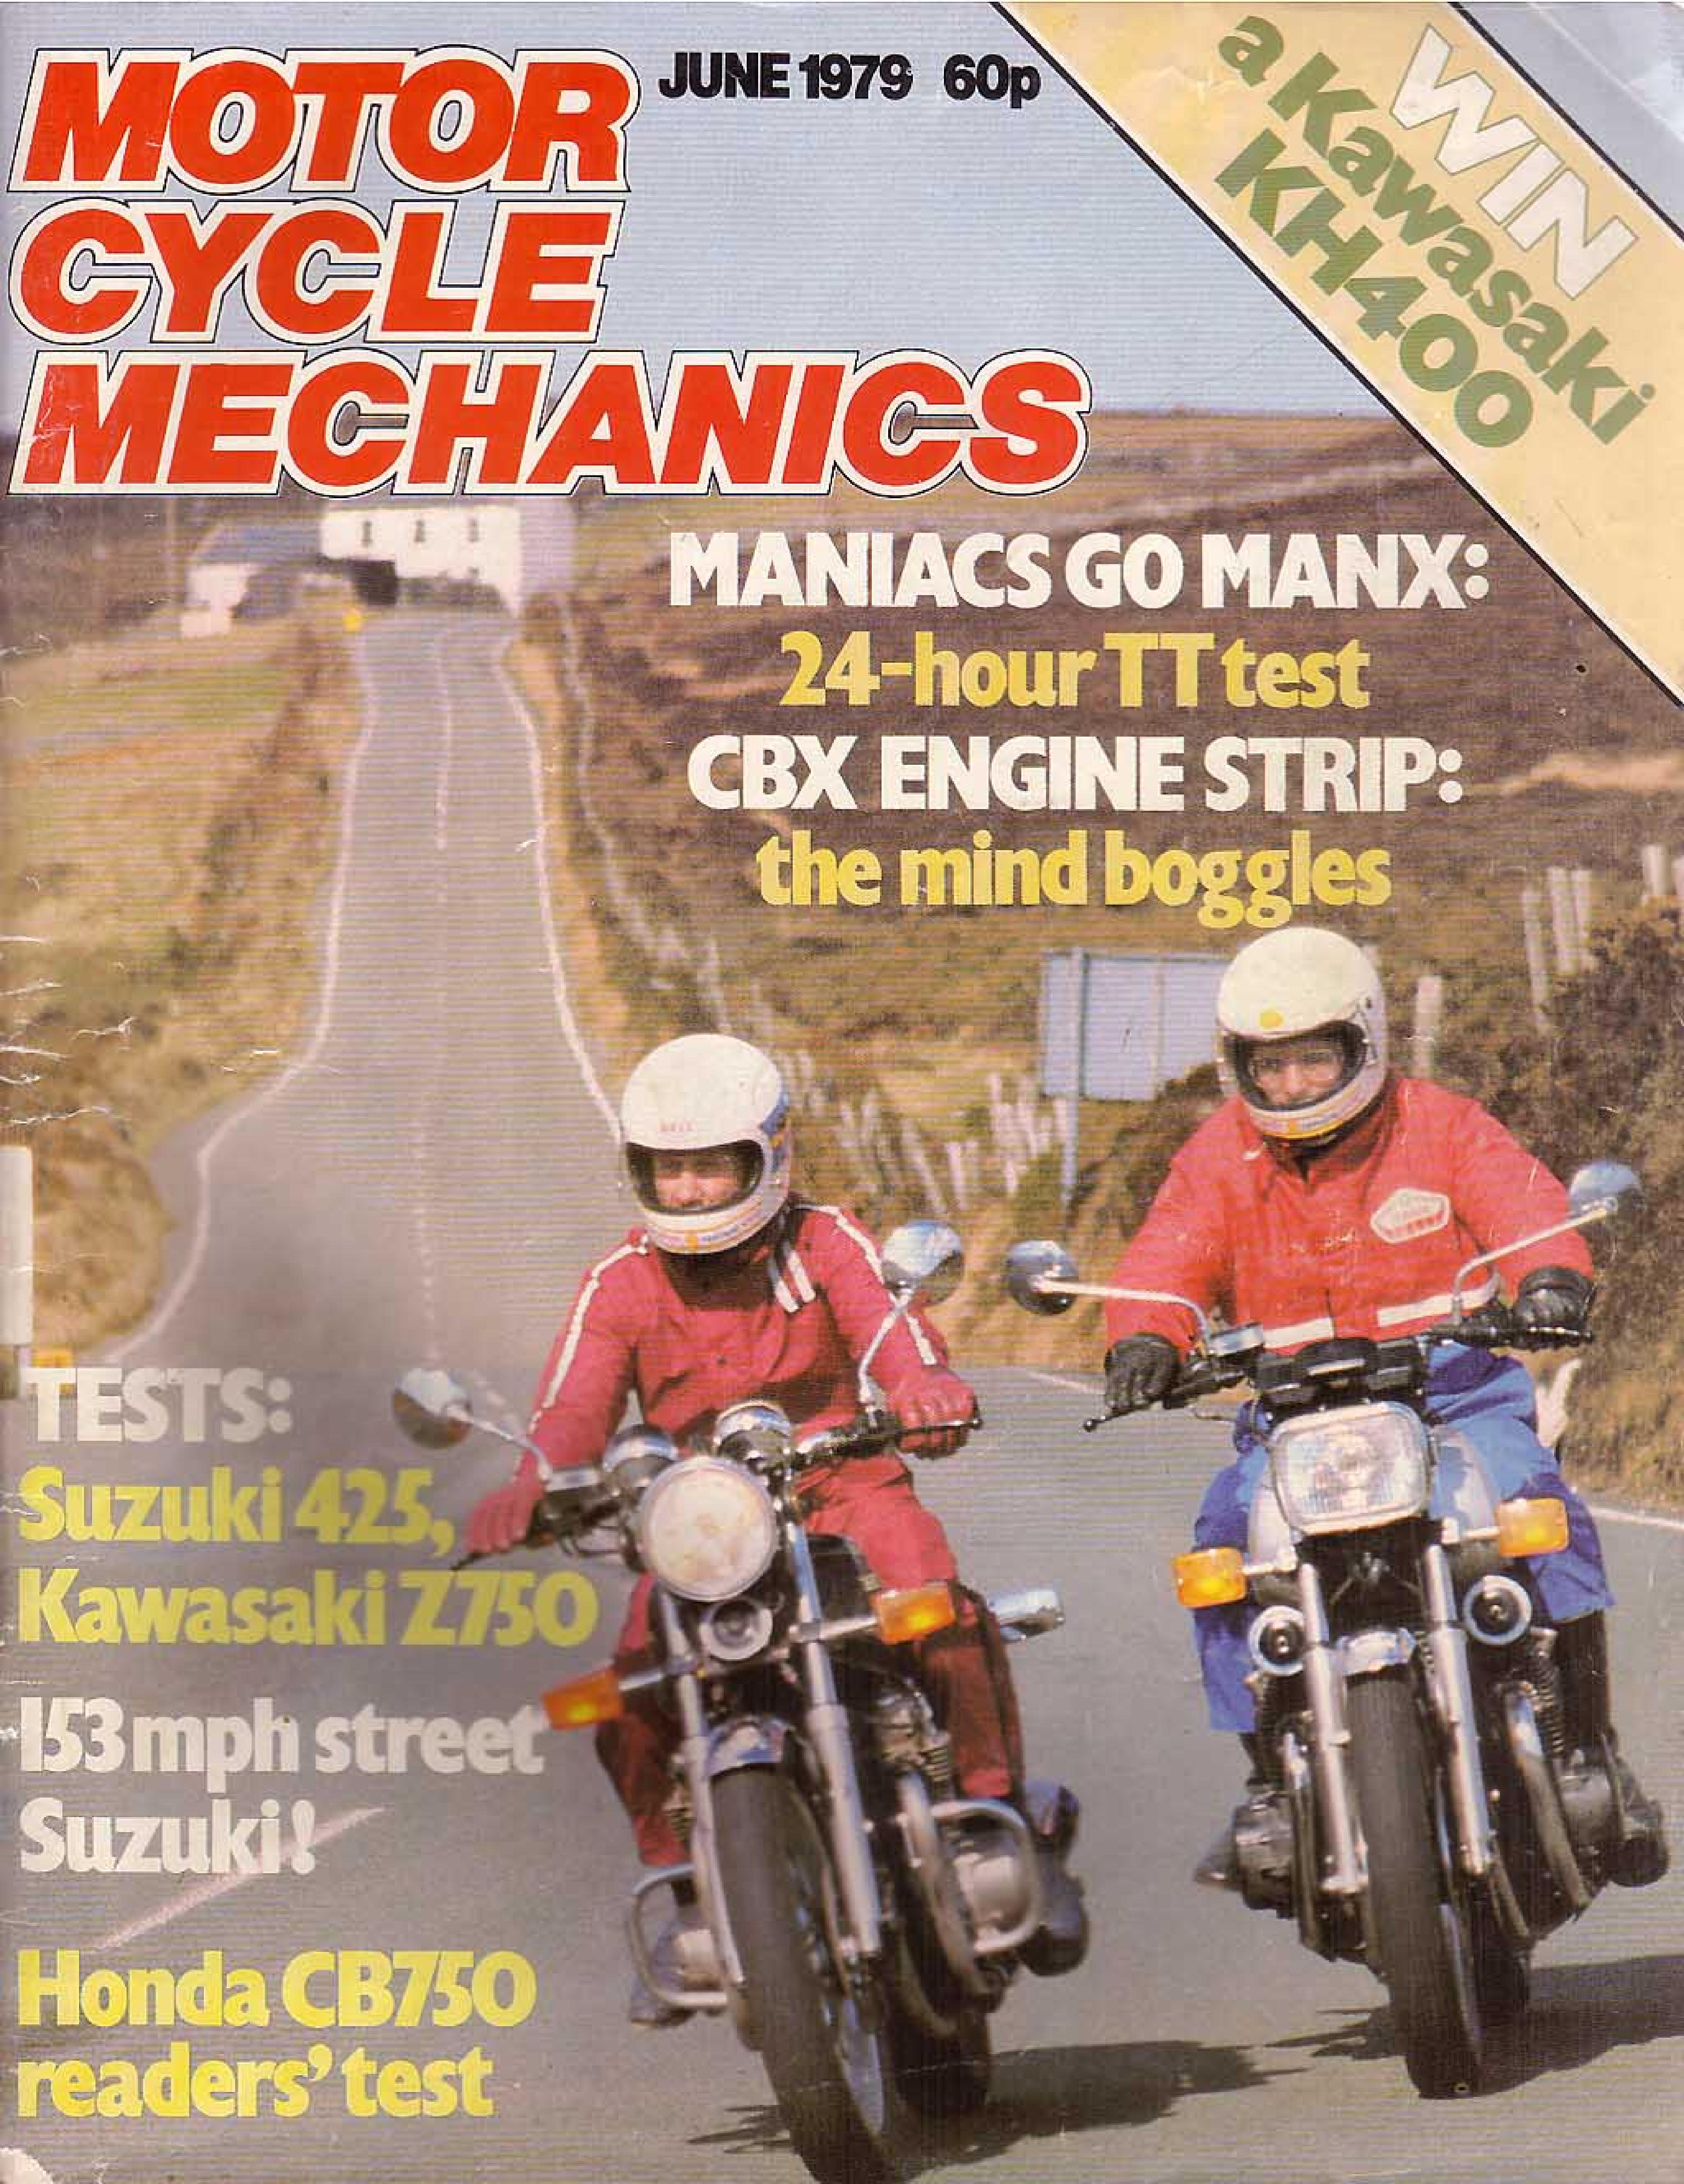 Motorcycle Mechanics about Honda CB650 (June 1979)